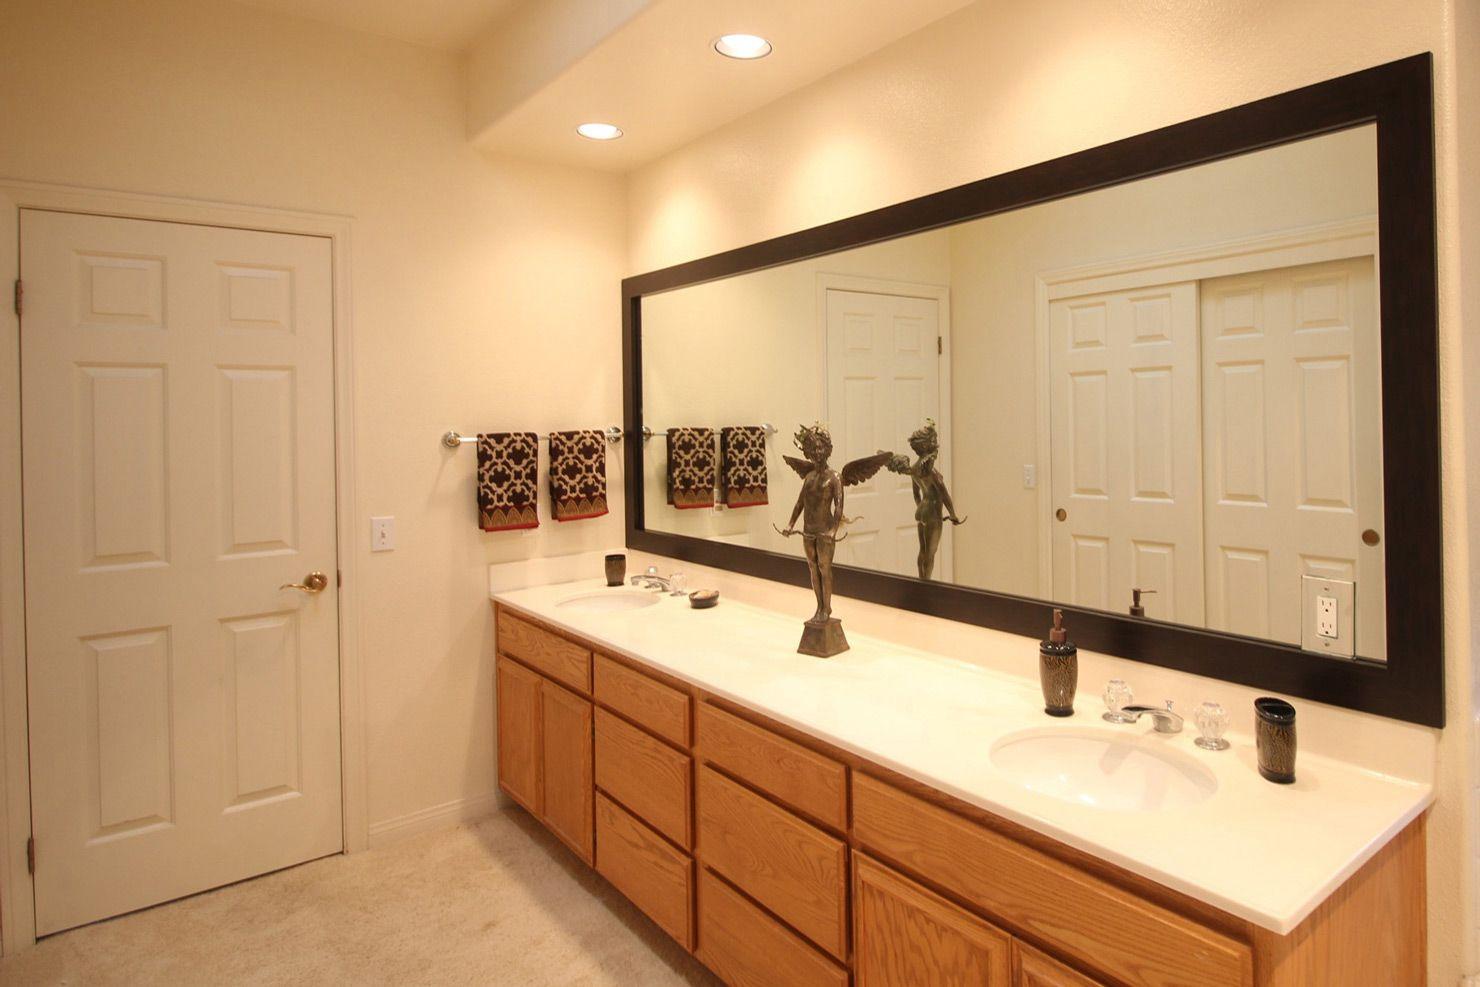 Large bathroom mirror home interior design ideas in 2020